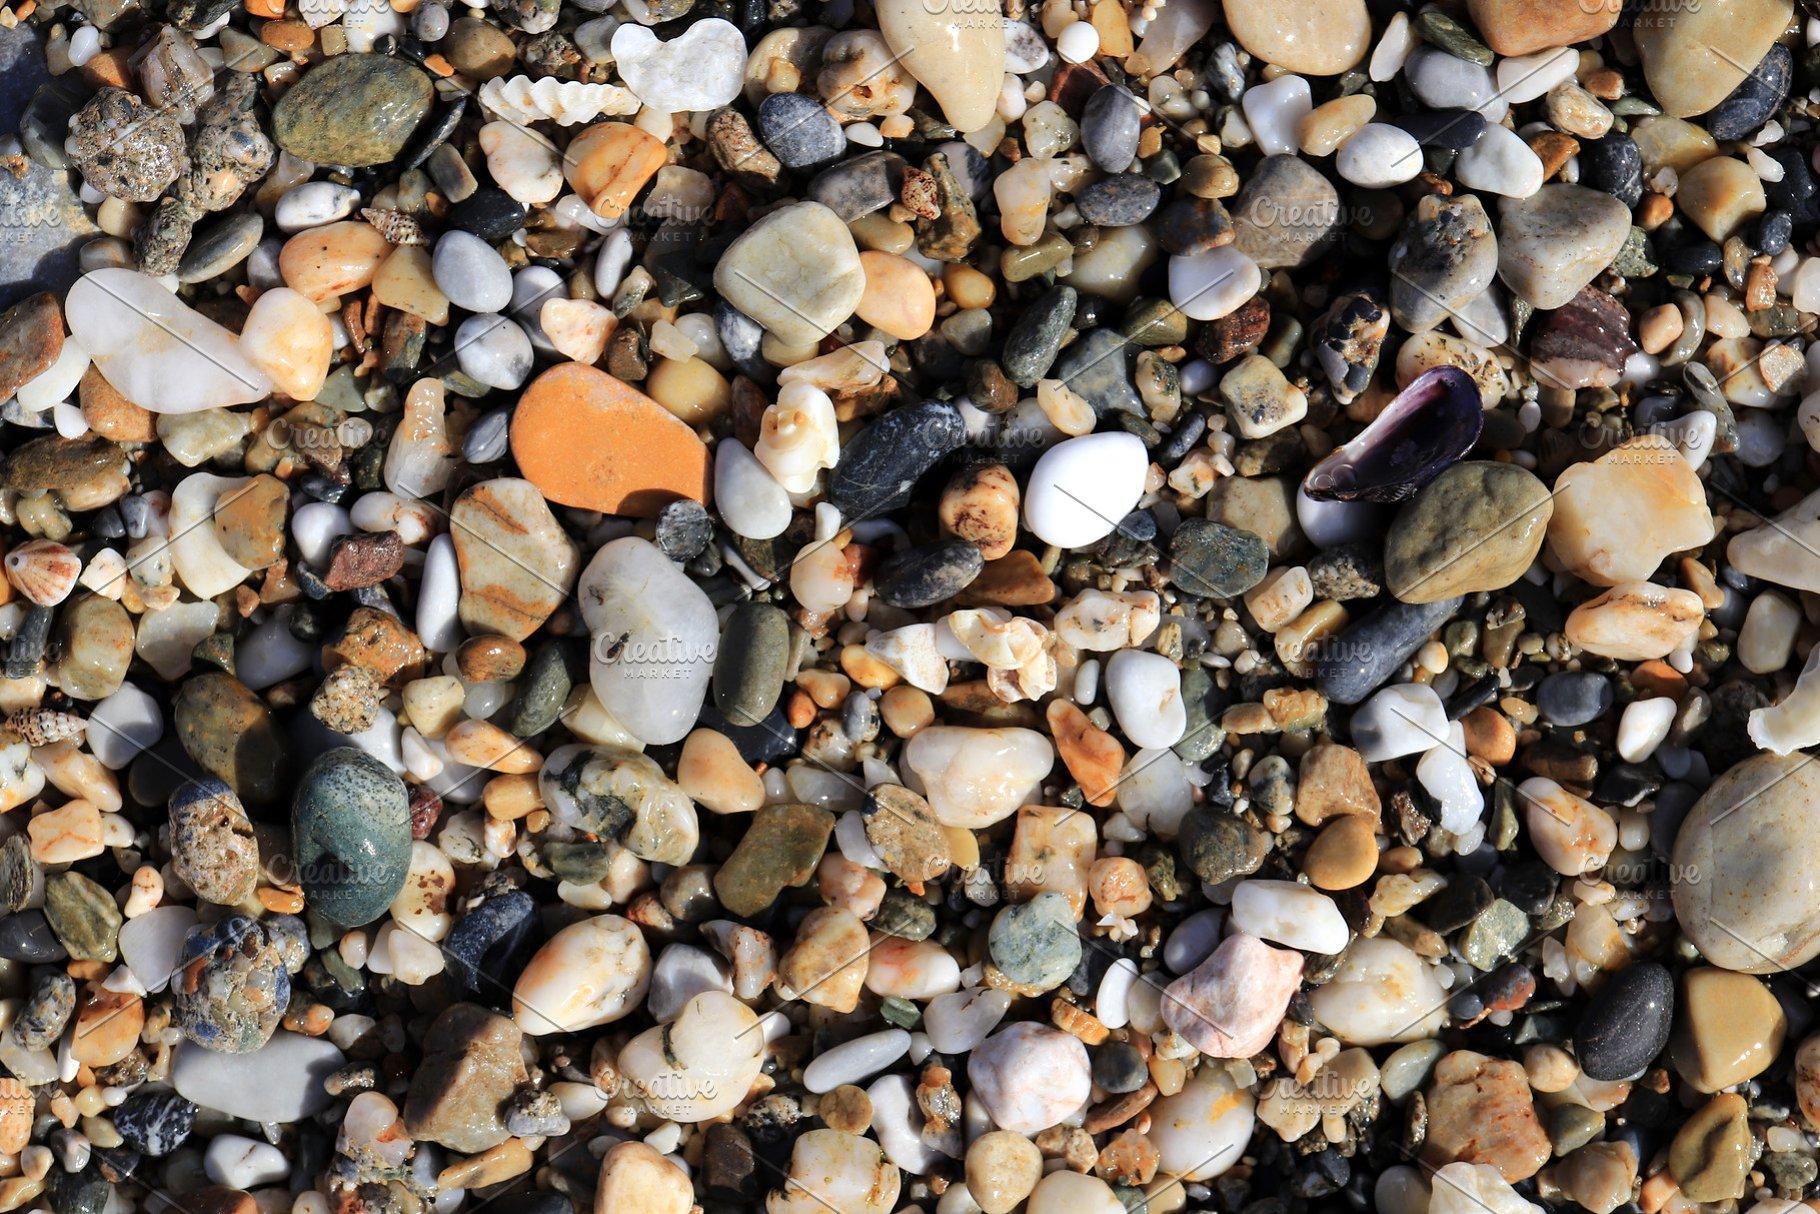 Friday Photoshop Blogging Other Pebble >> Stone Pebbles Texture Nature Photos Creative Market